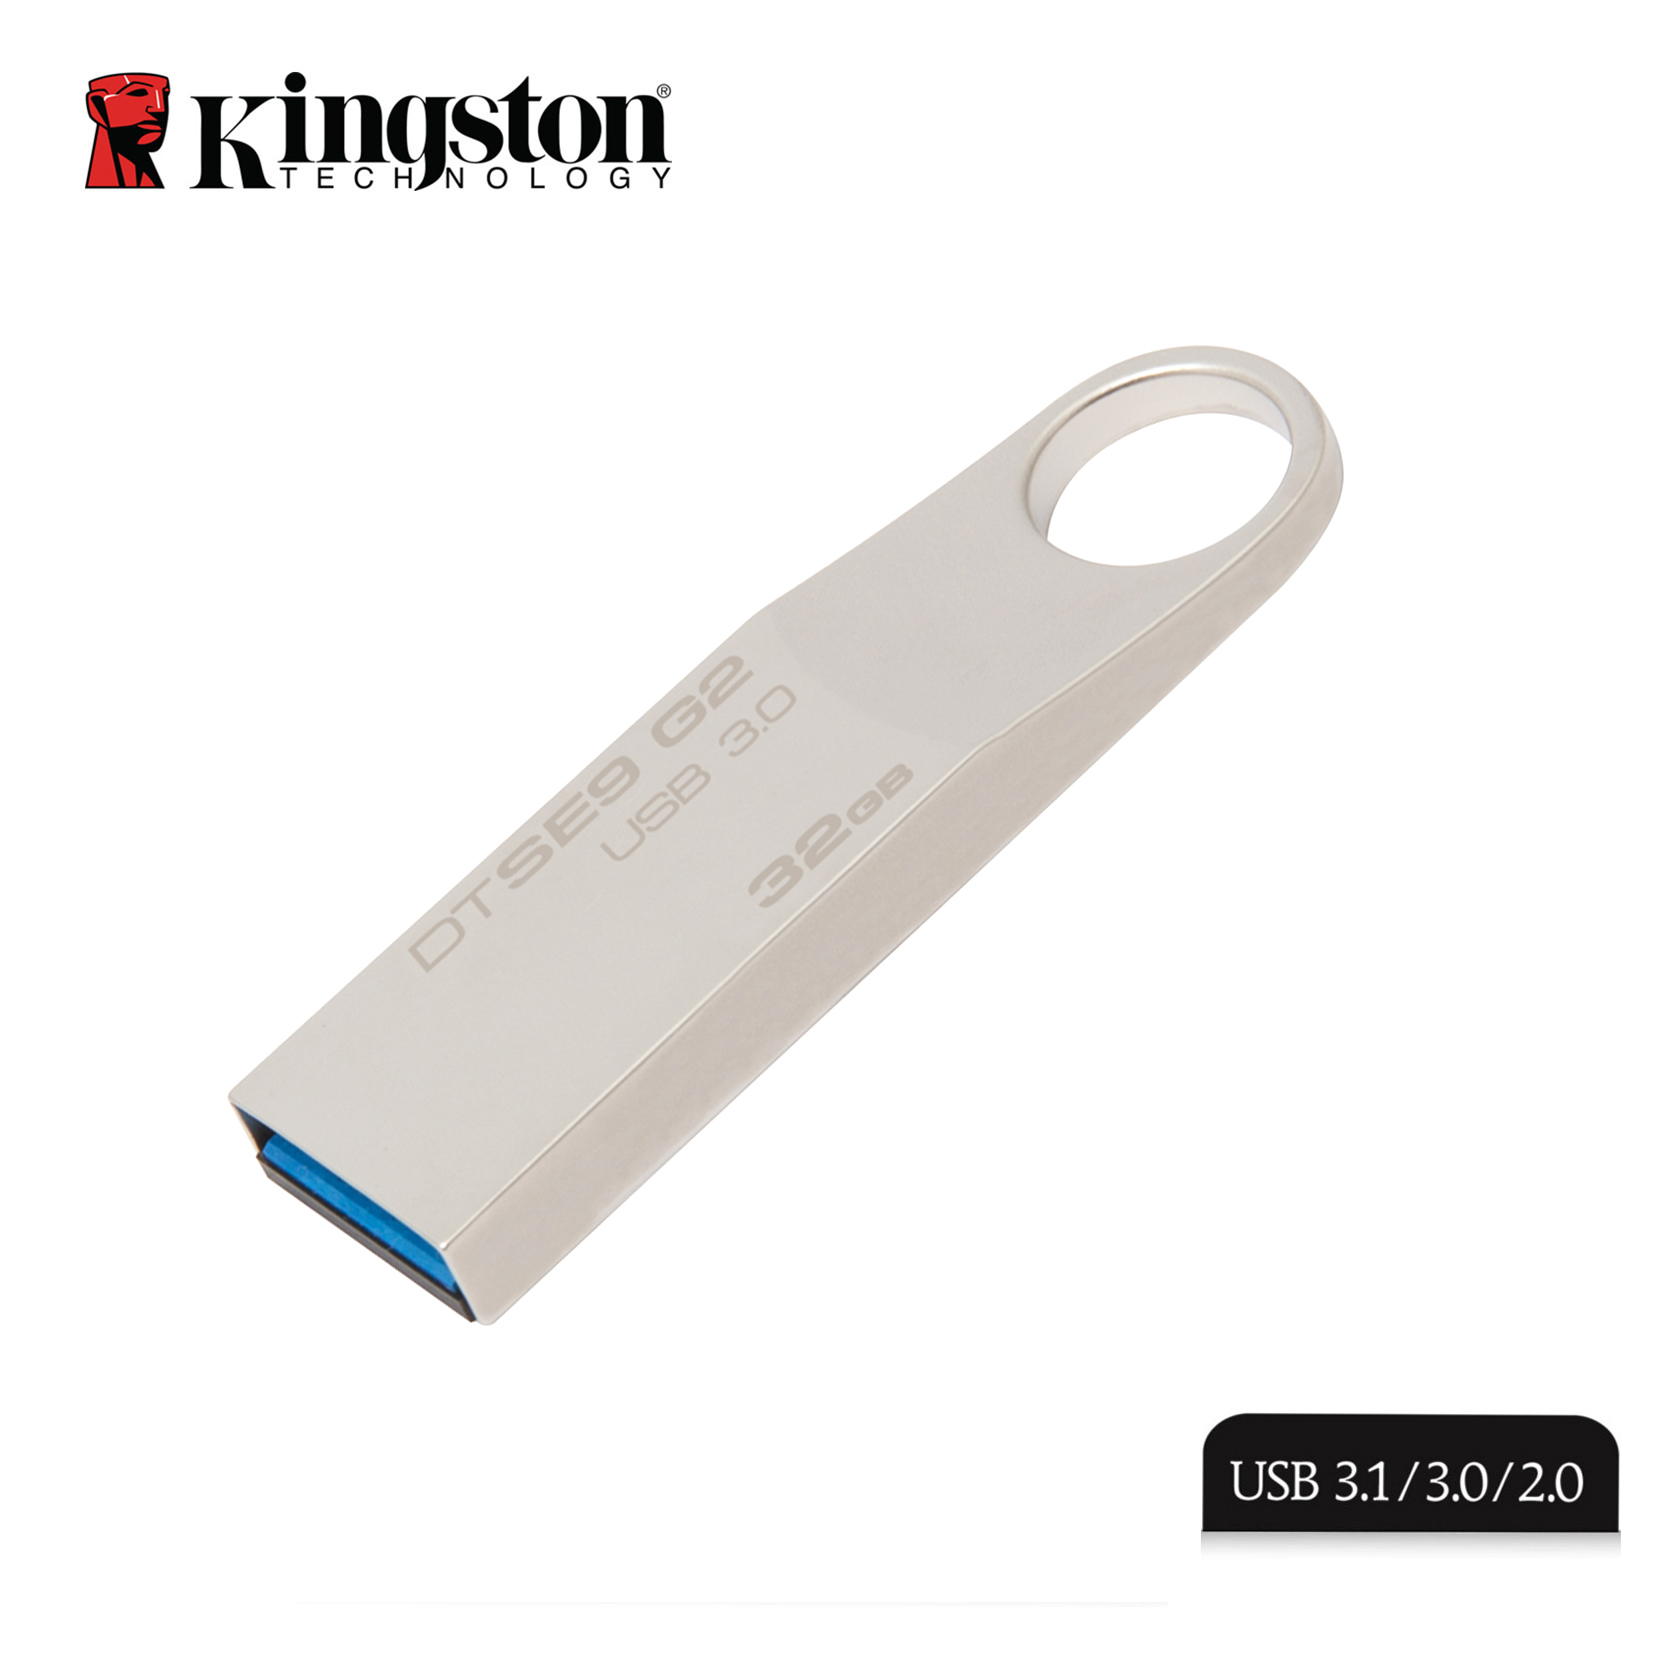 Kingston pendrive memoria usb 32gb flash drive otg caneta usb memory stick micro u disk